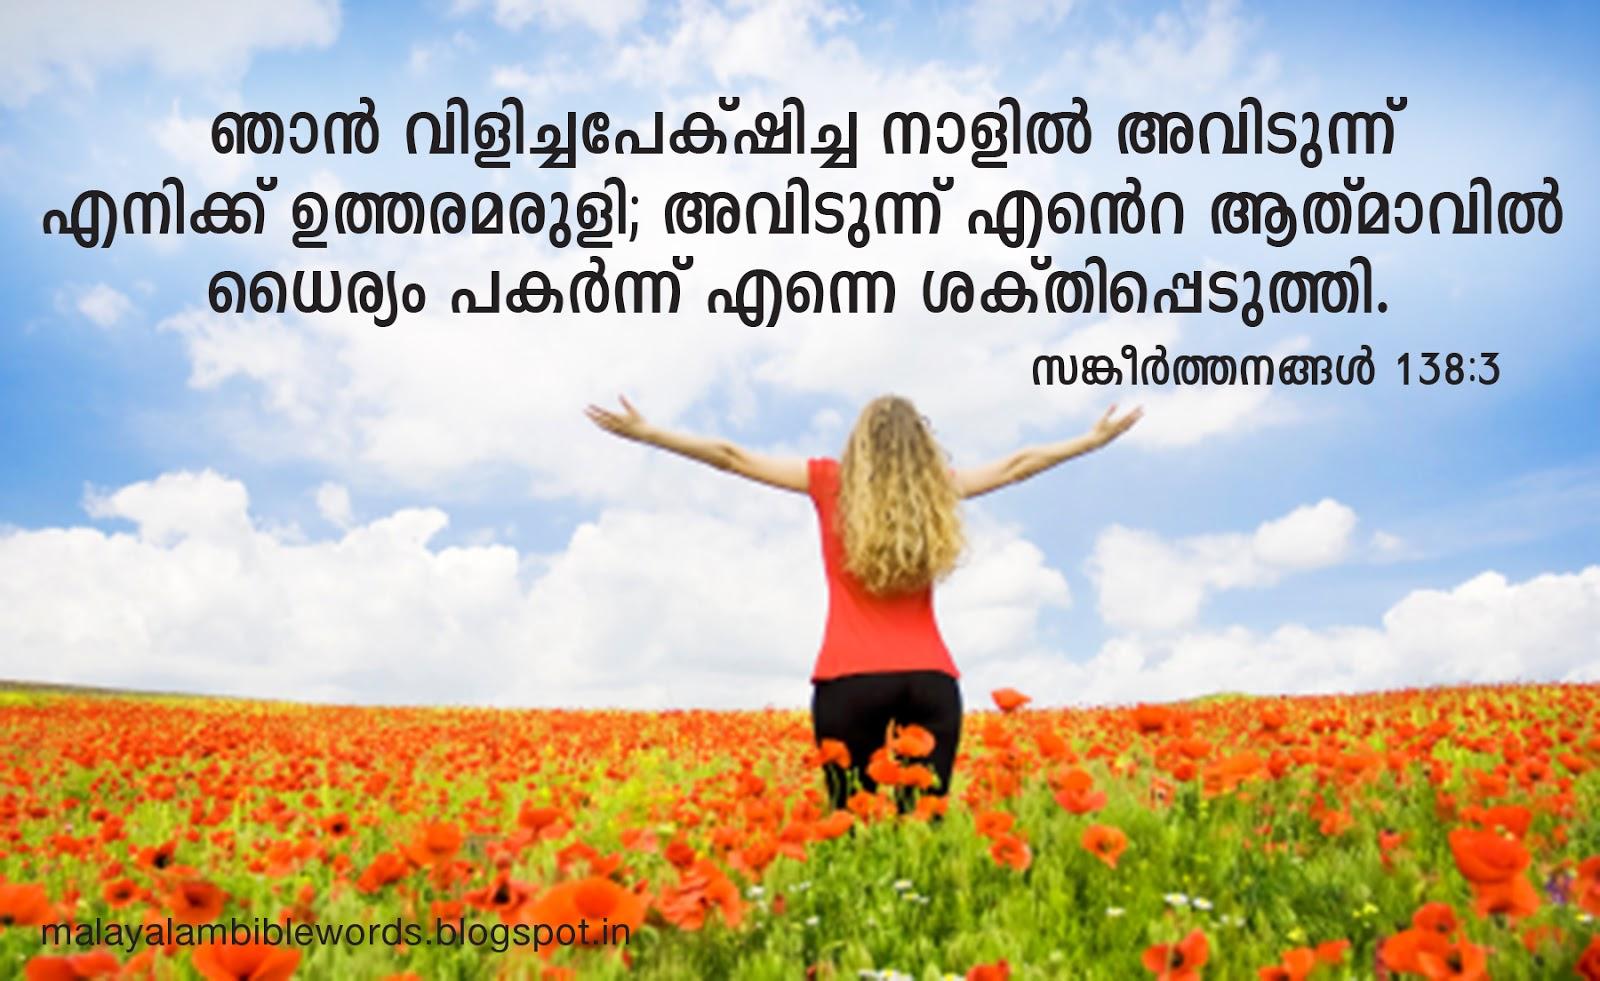 Malayalam Bible Words: bible verses, bible verses for youth